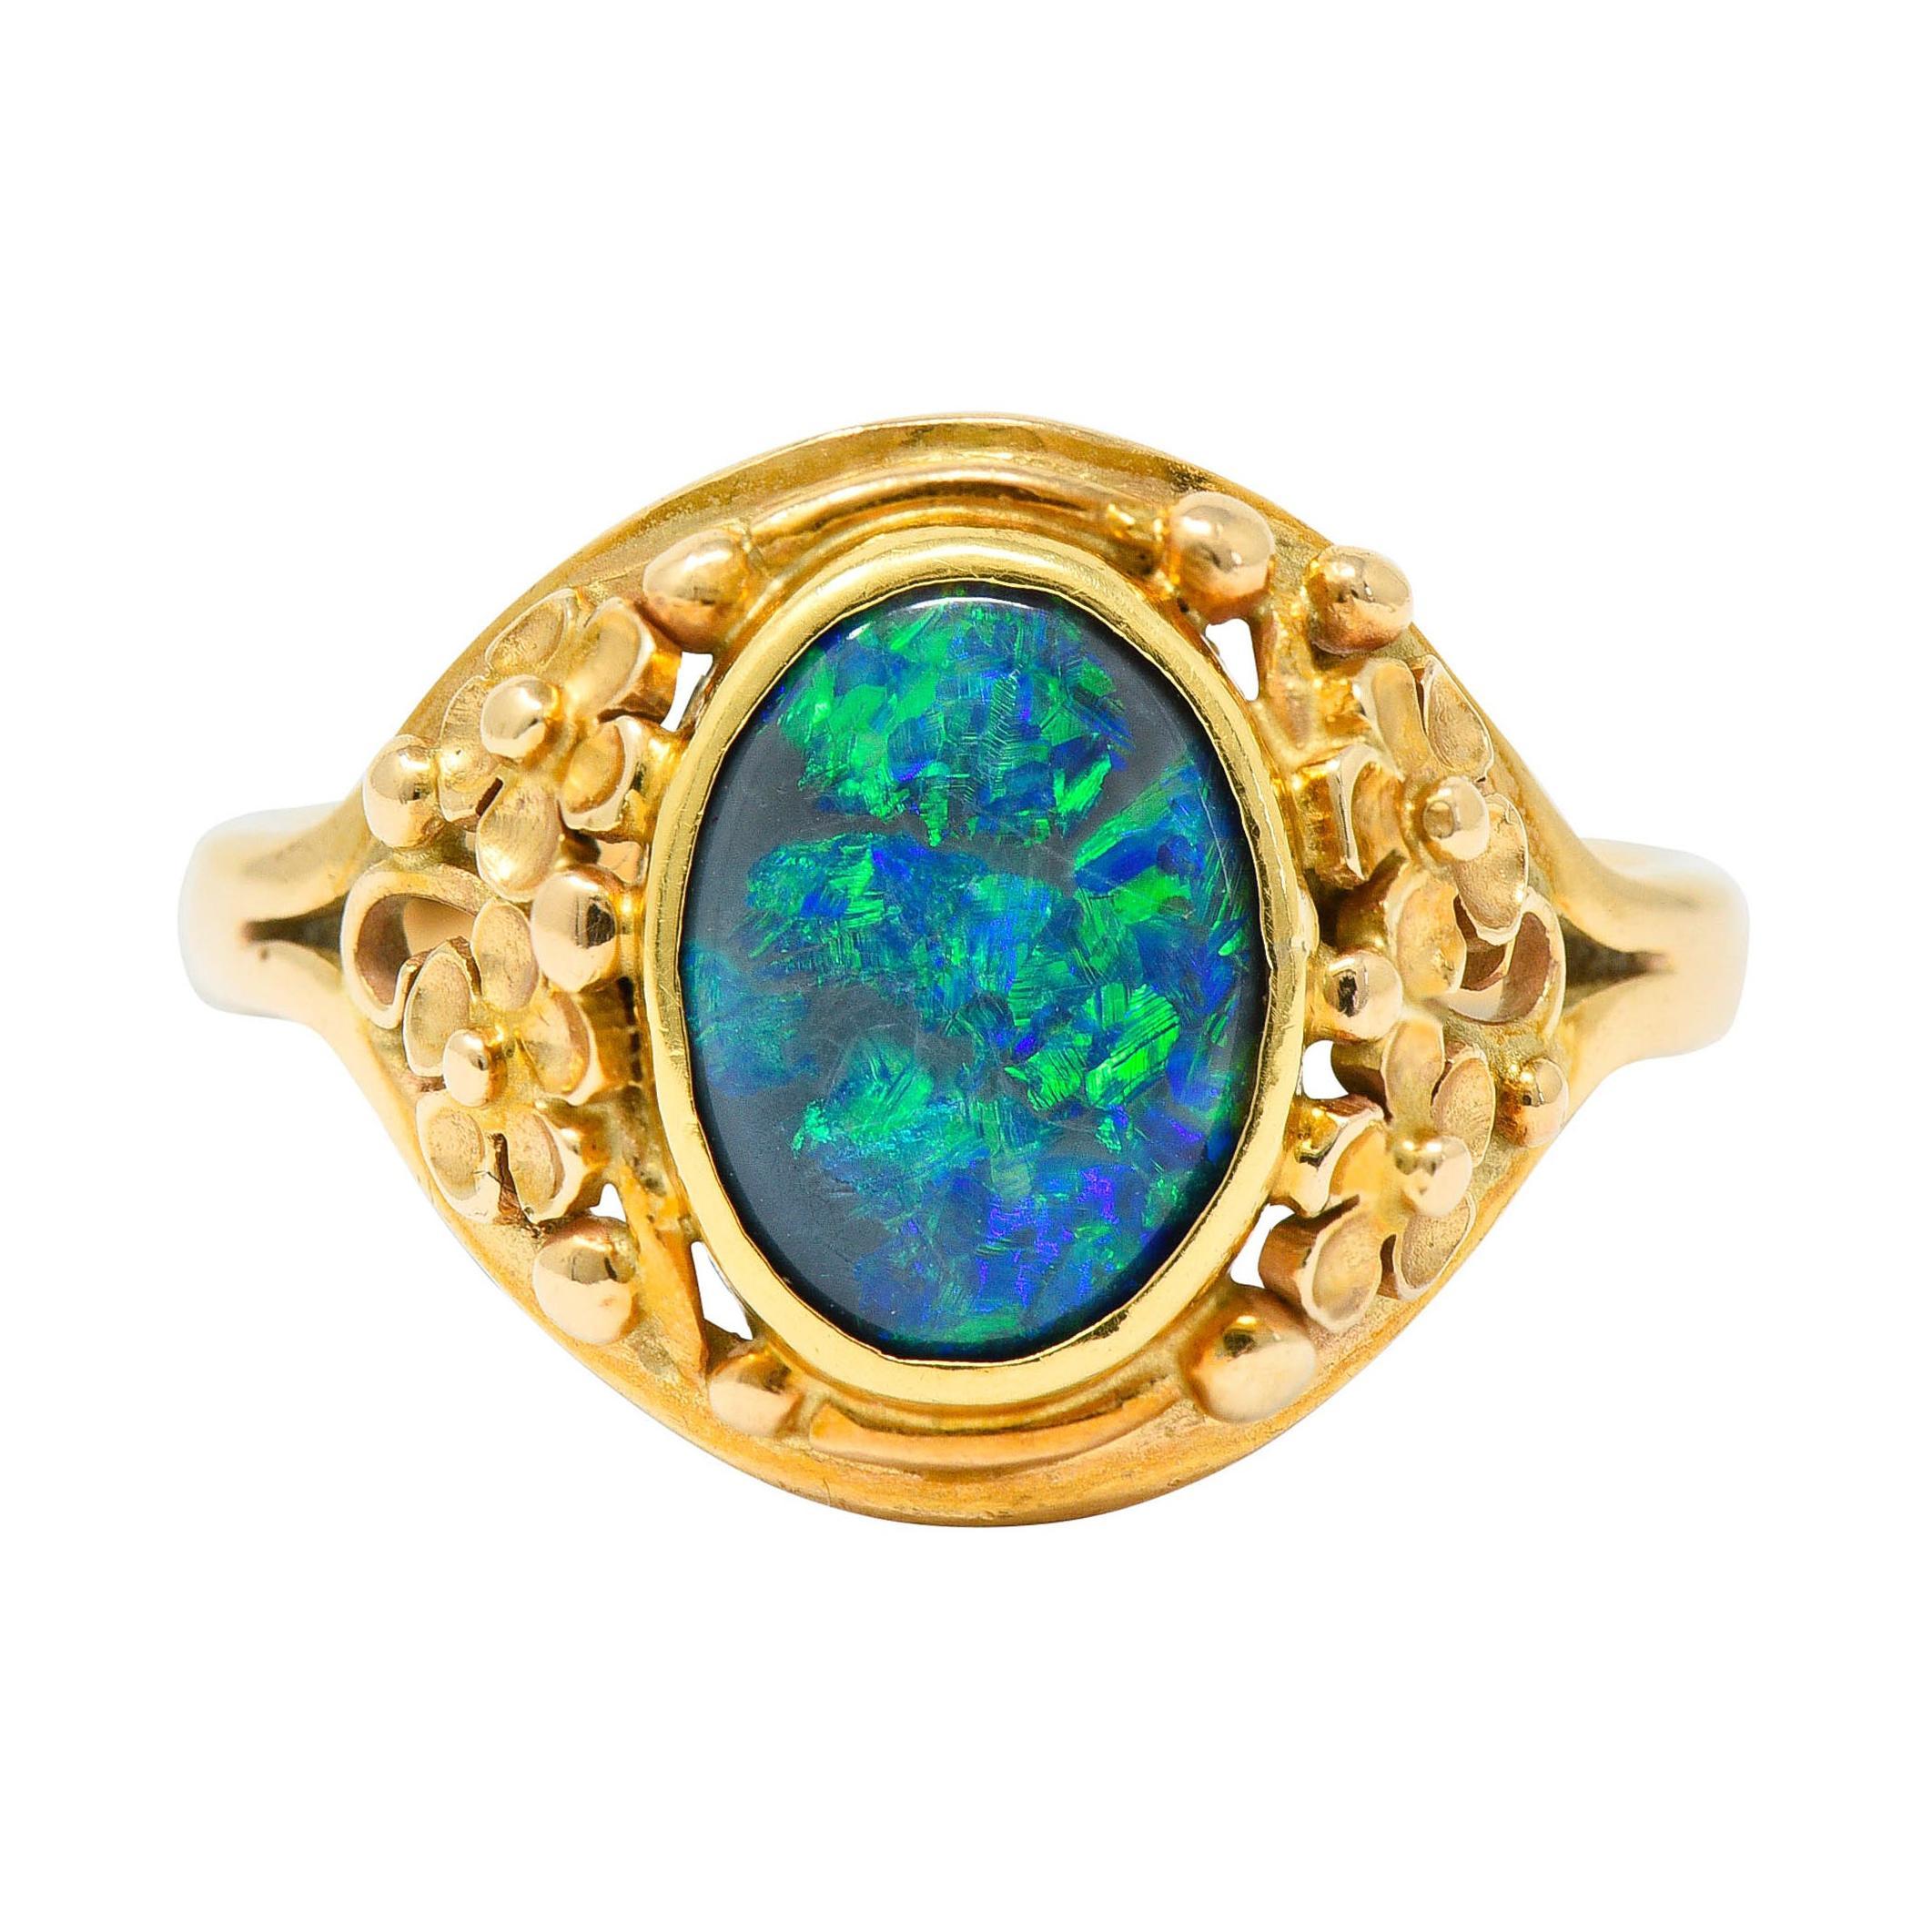 Art Nouveau 14 Karat Gold Black Opal Flower Ring